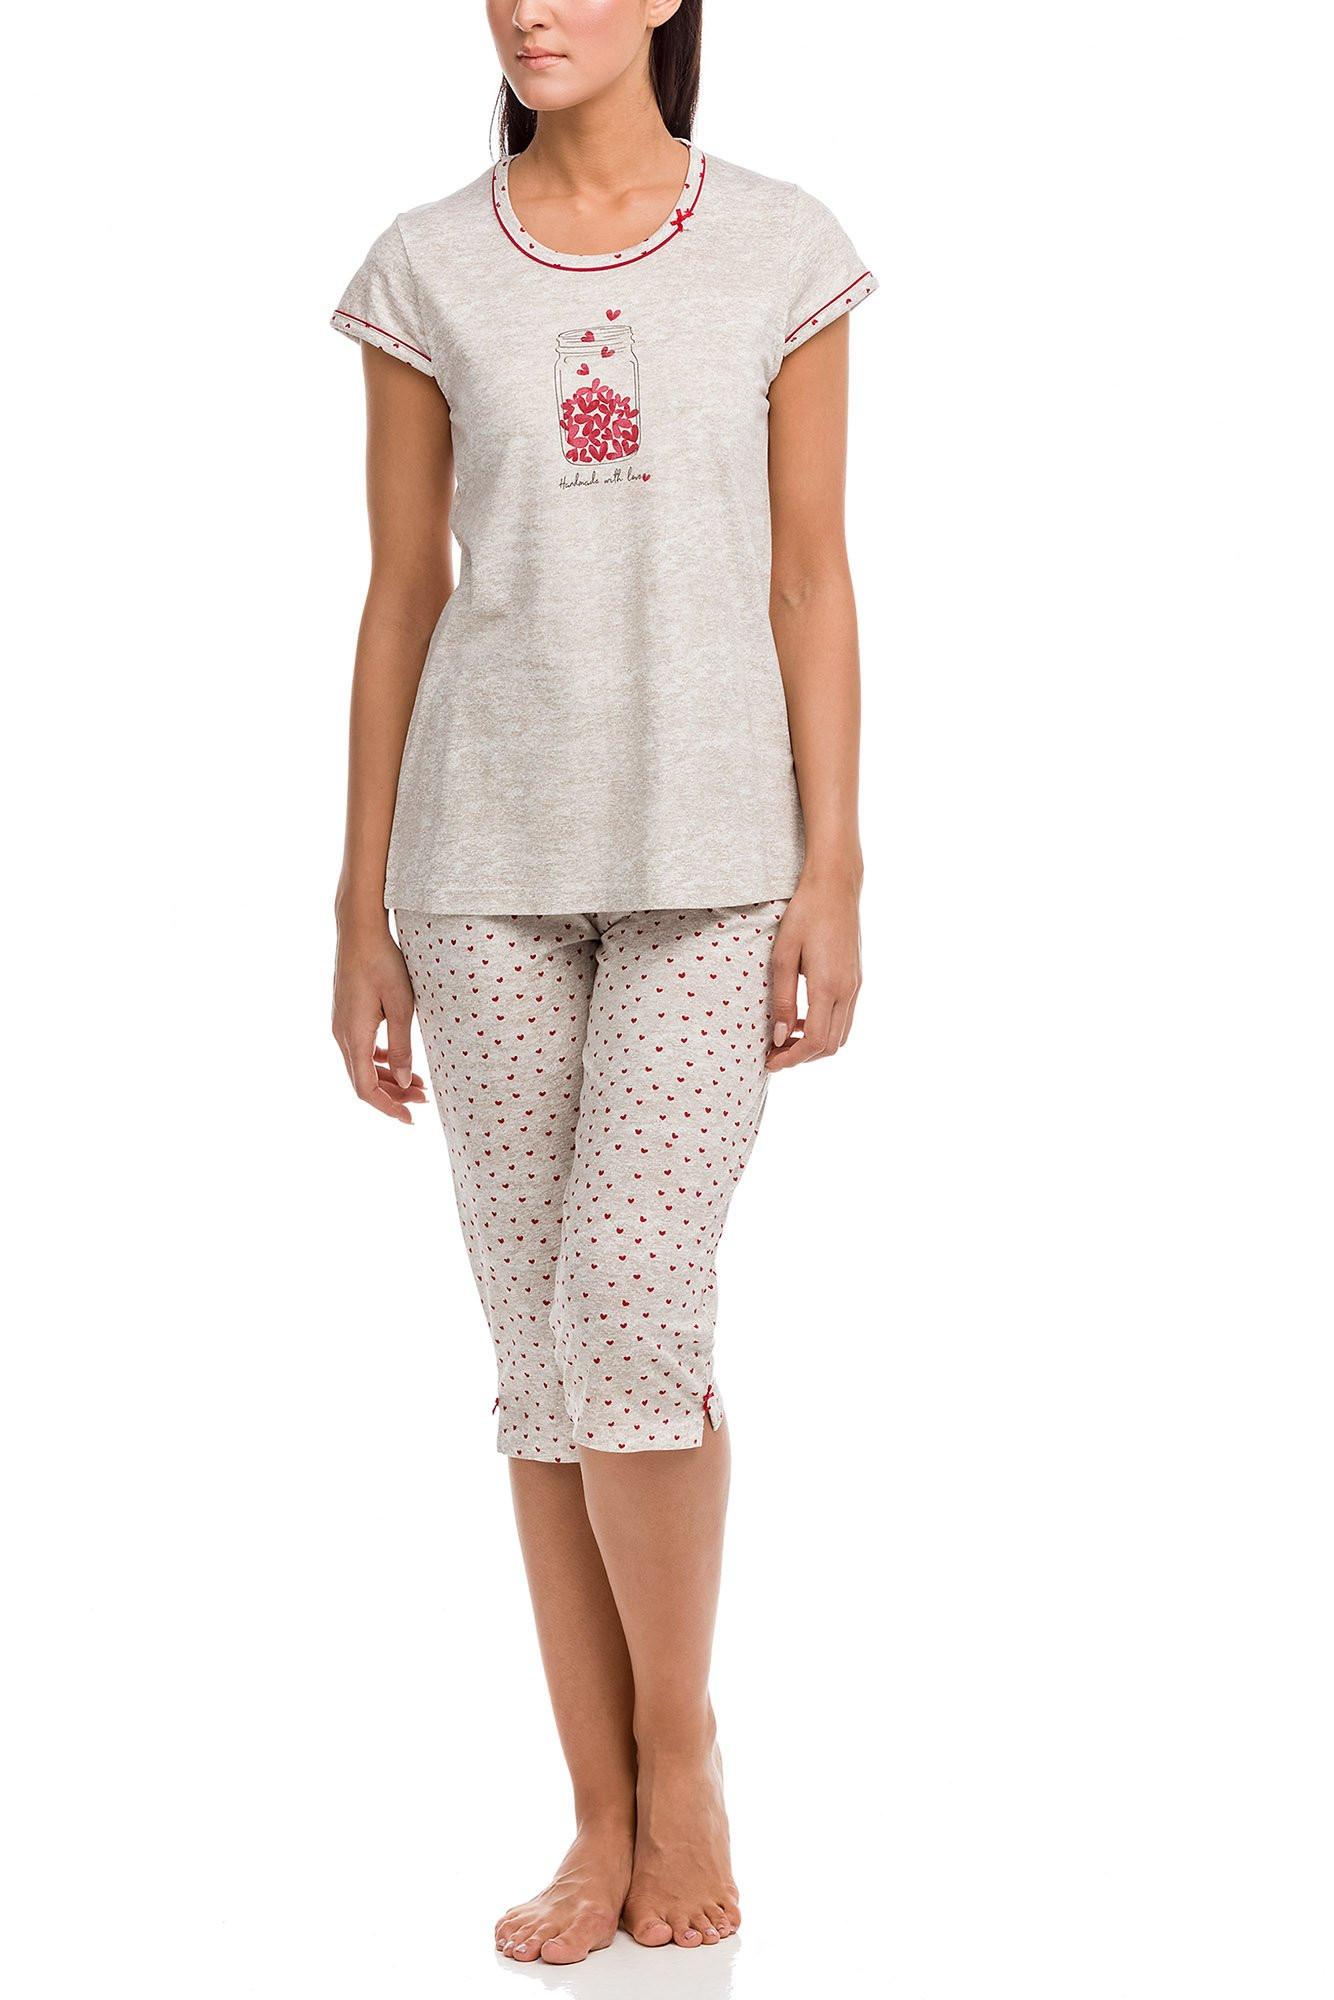 Vamp - Dámske pyžamo 12100 - Vamp beige s